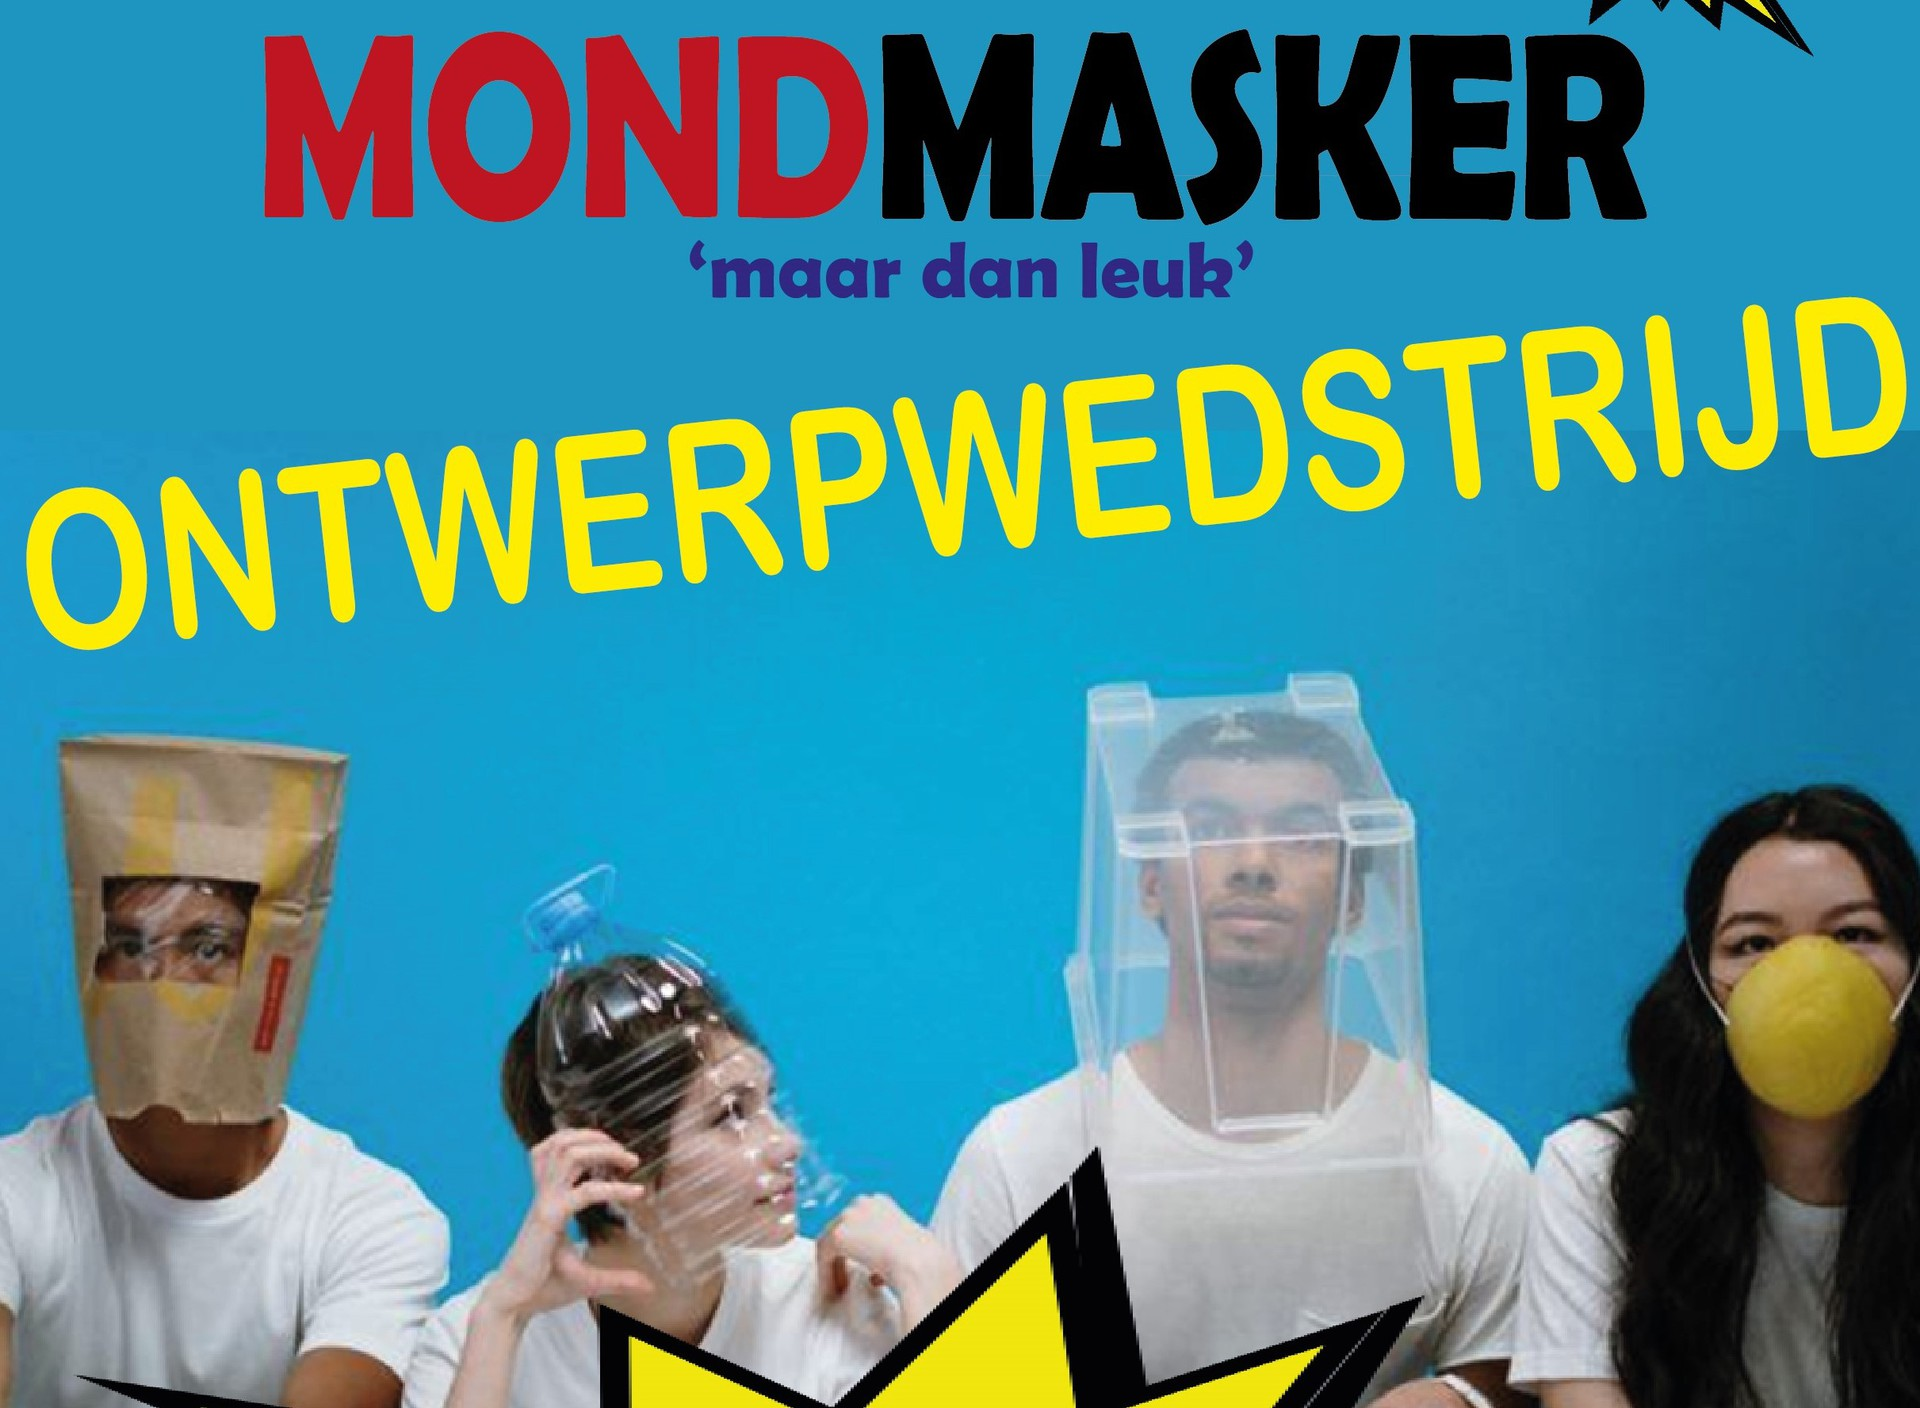 Doe mee aan de Bonhoeffer Mondmasker 'maar dan leuk' ontwerpwedstrijd!